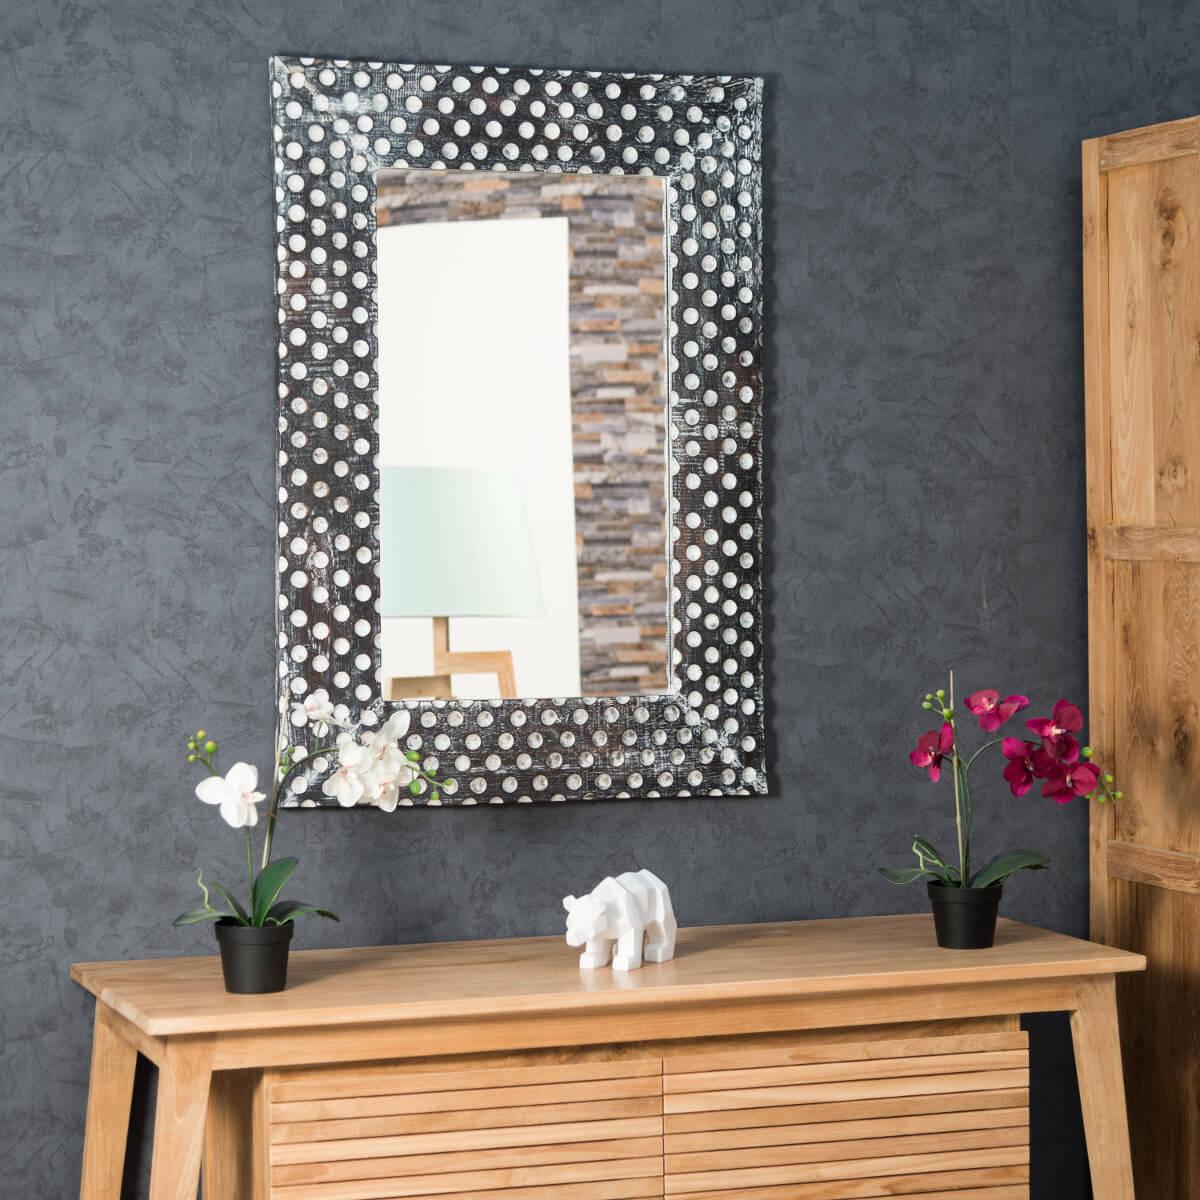 Miroir miroir bois massif rectangulaire bois patin for Miroir bois blanc